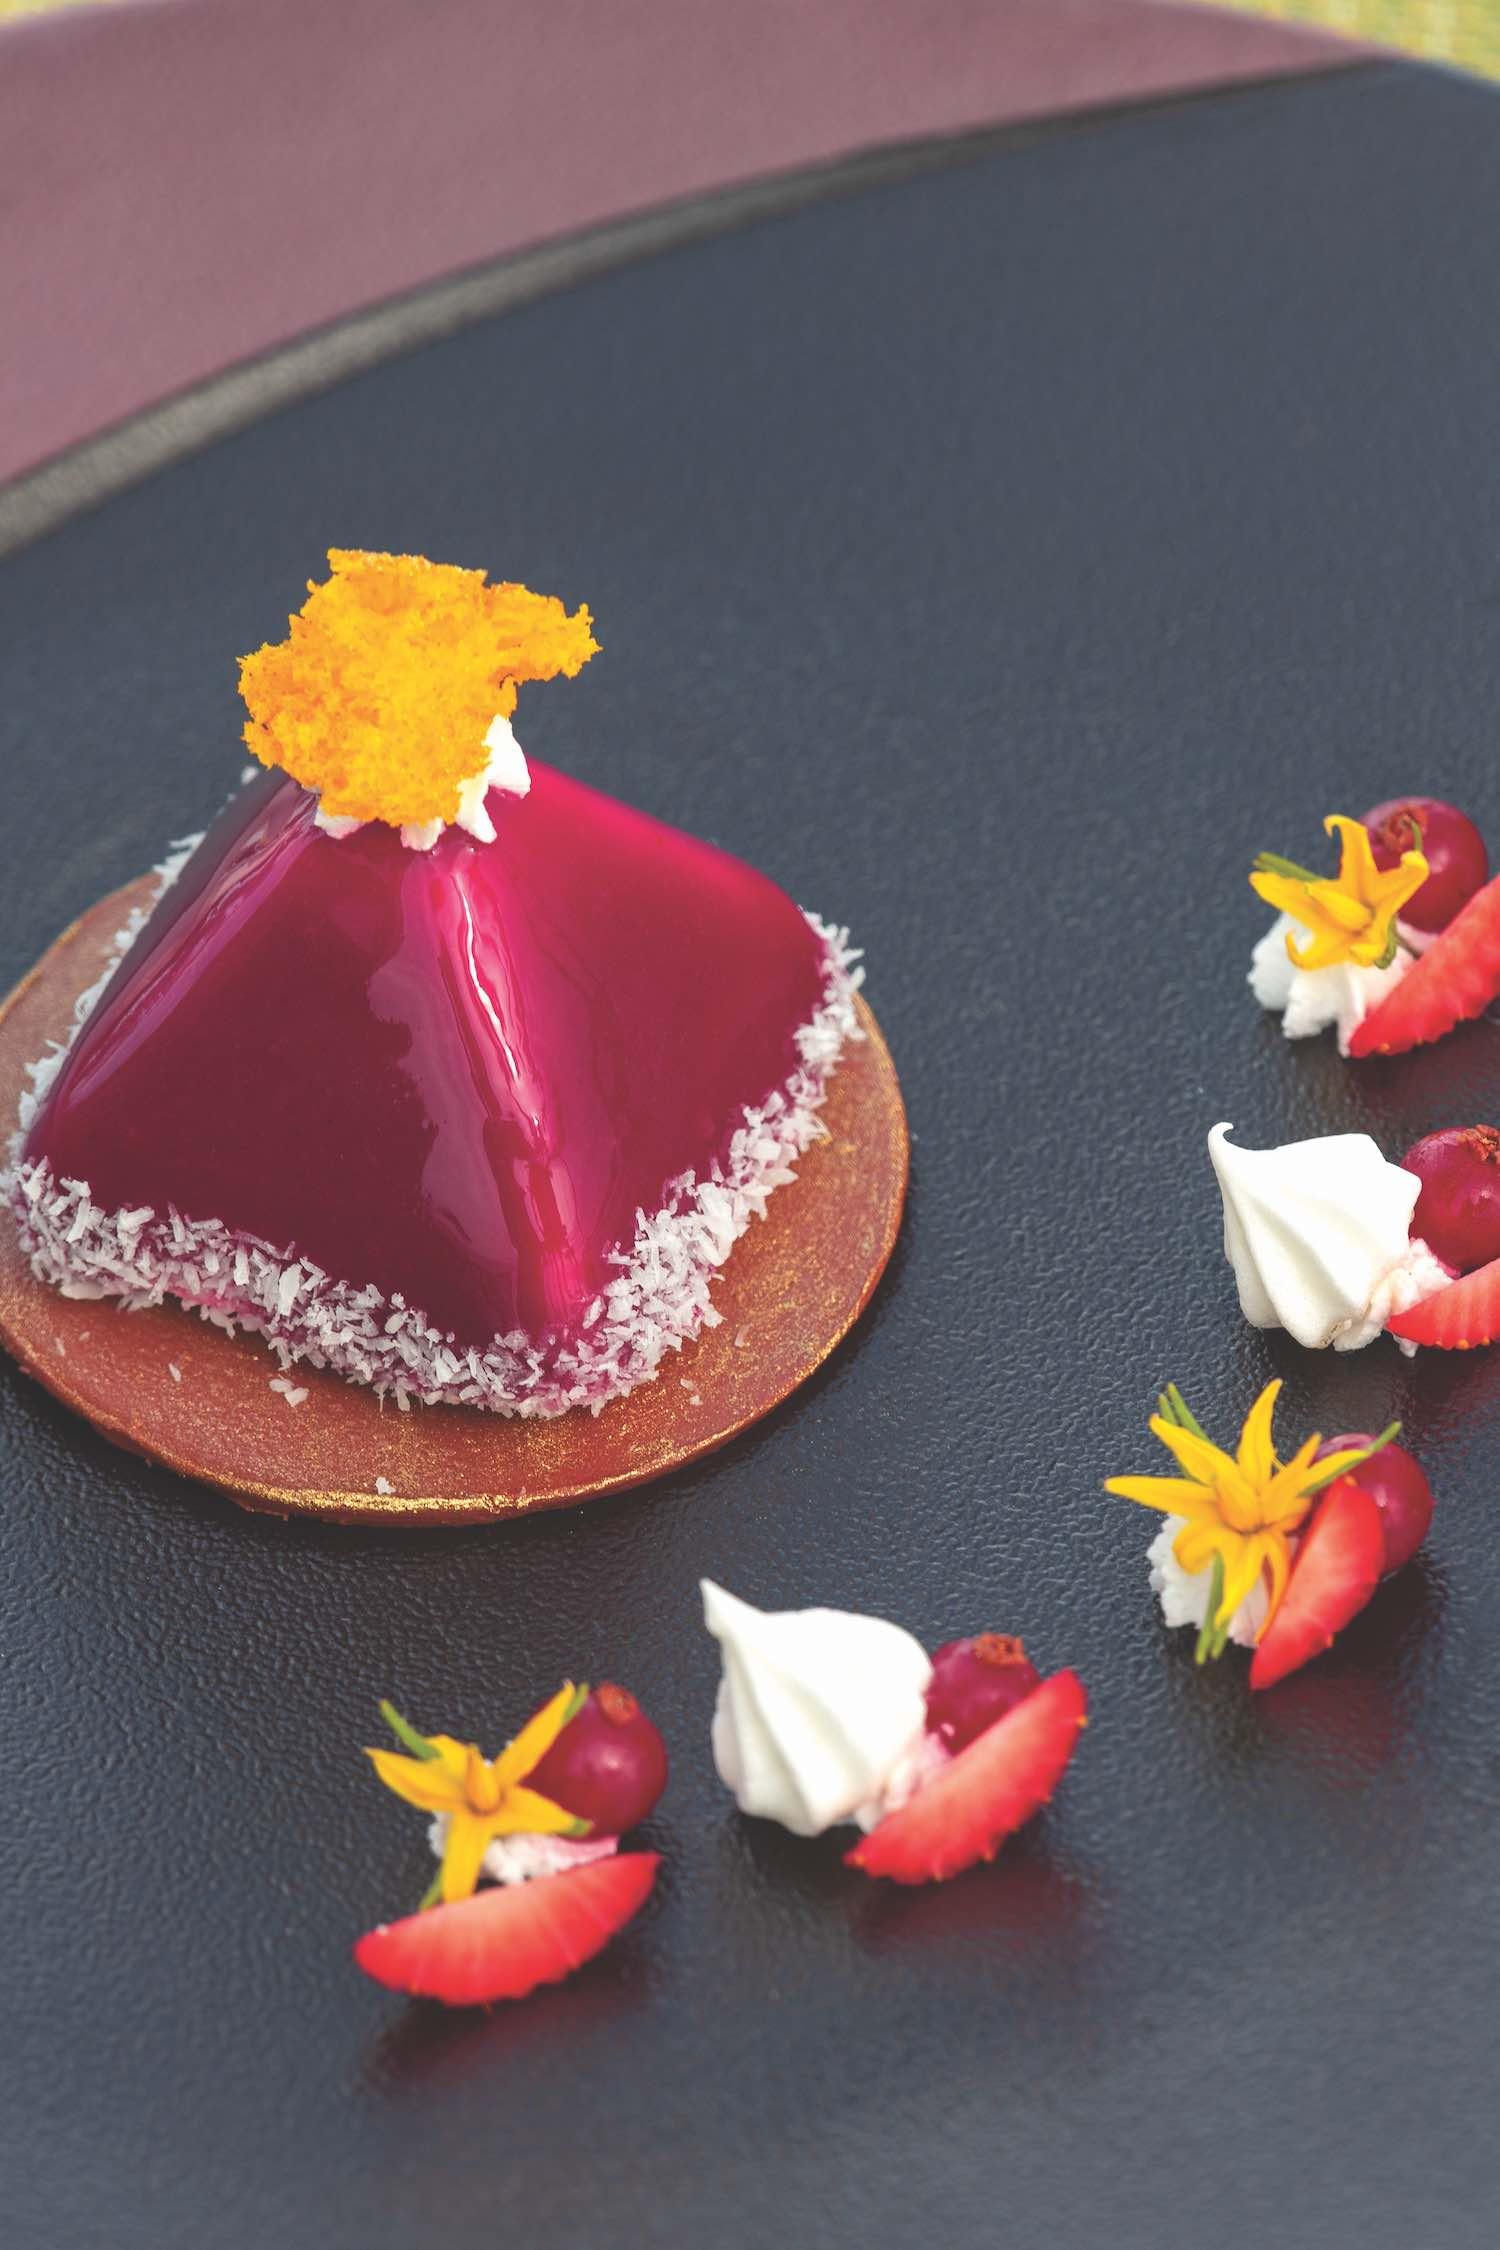 maldives-oblu-select-at-sangeli-speciality-dining-holiday-honeymoon-vacation-invite-to-paradise.jpg